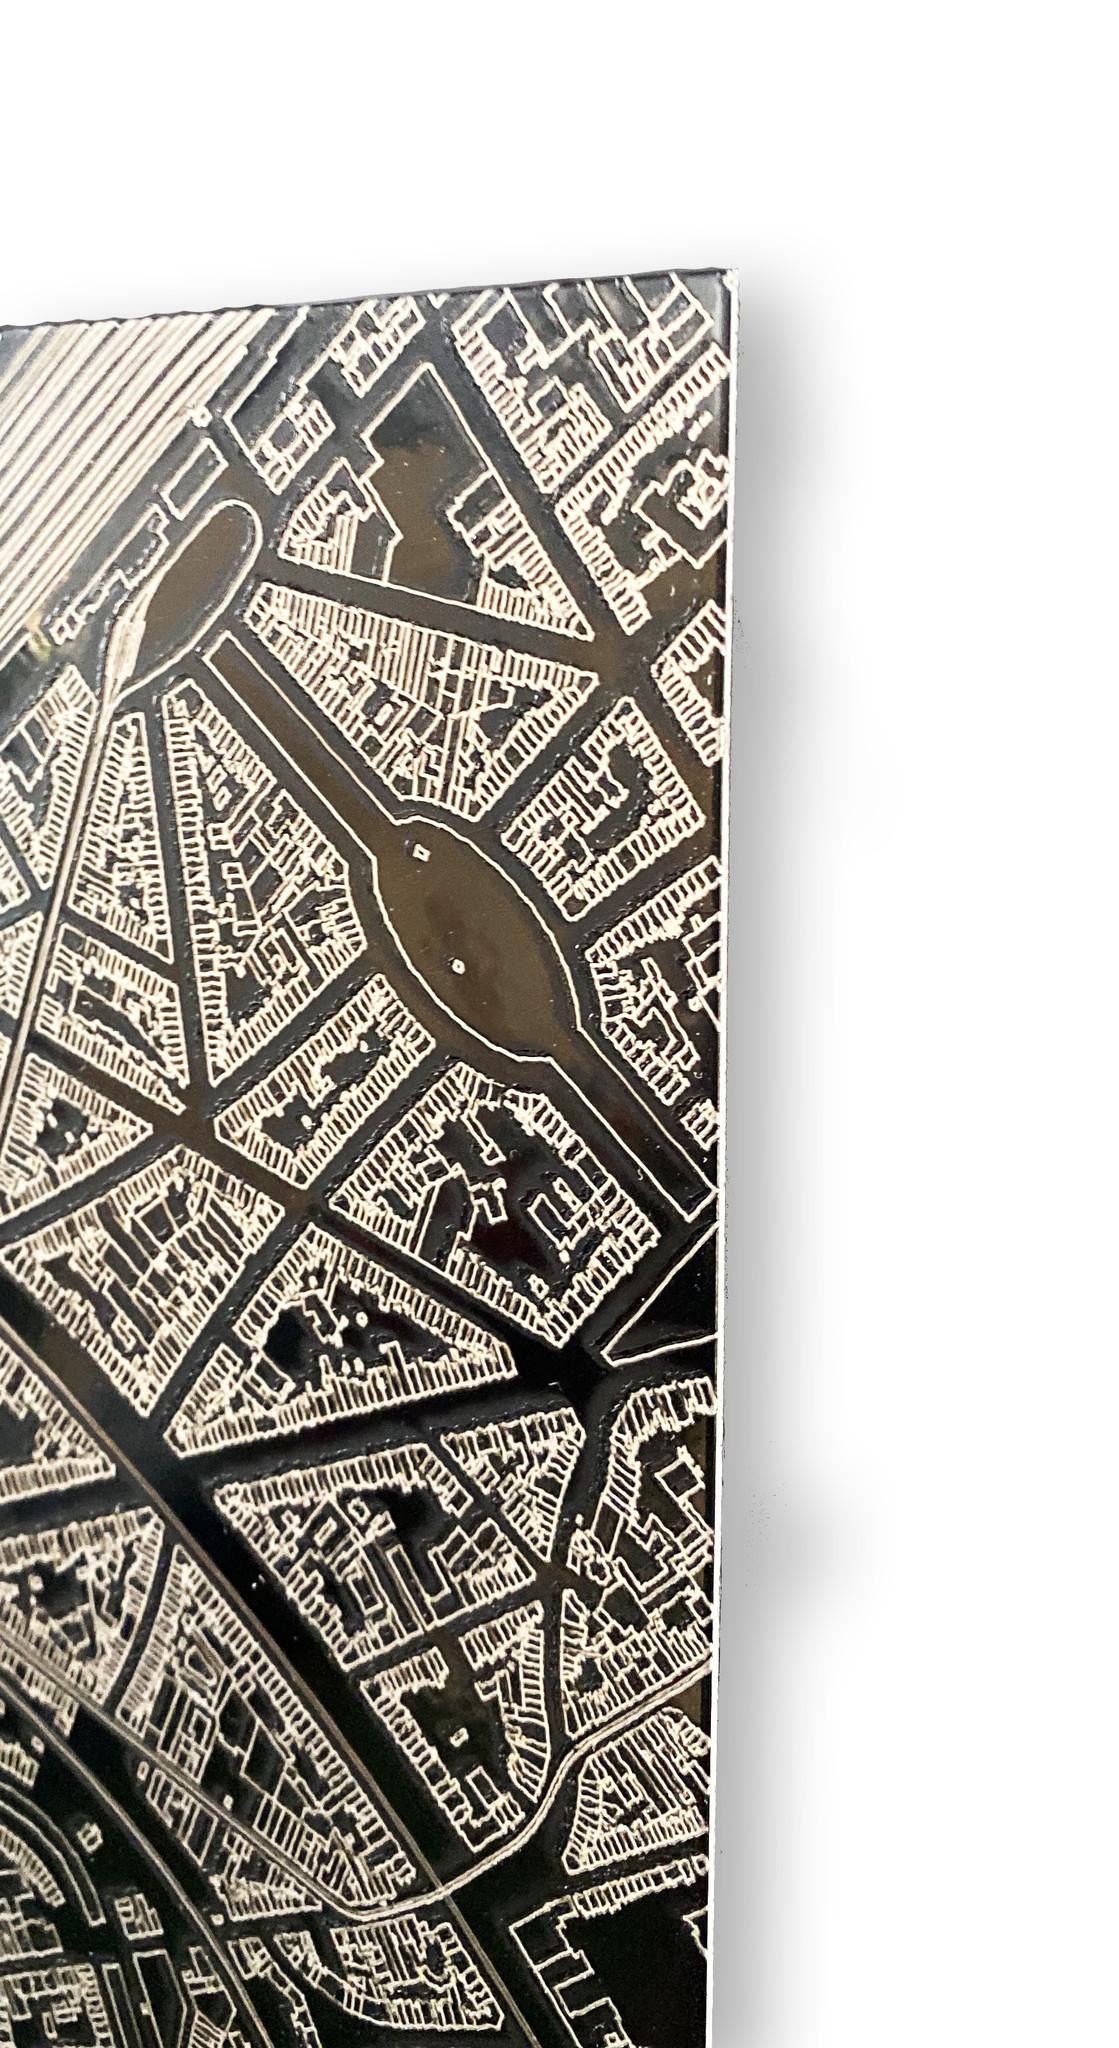 Stadtkarte Den Haag XL | Aluminium Wanddekoration-5